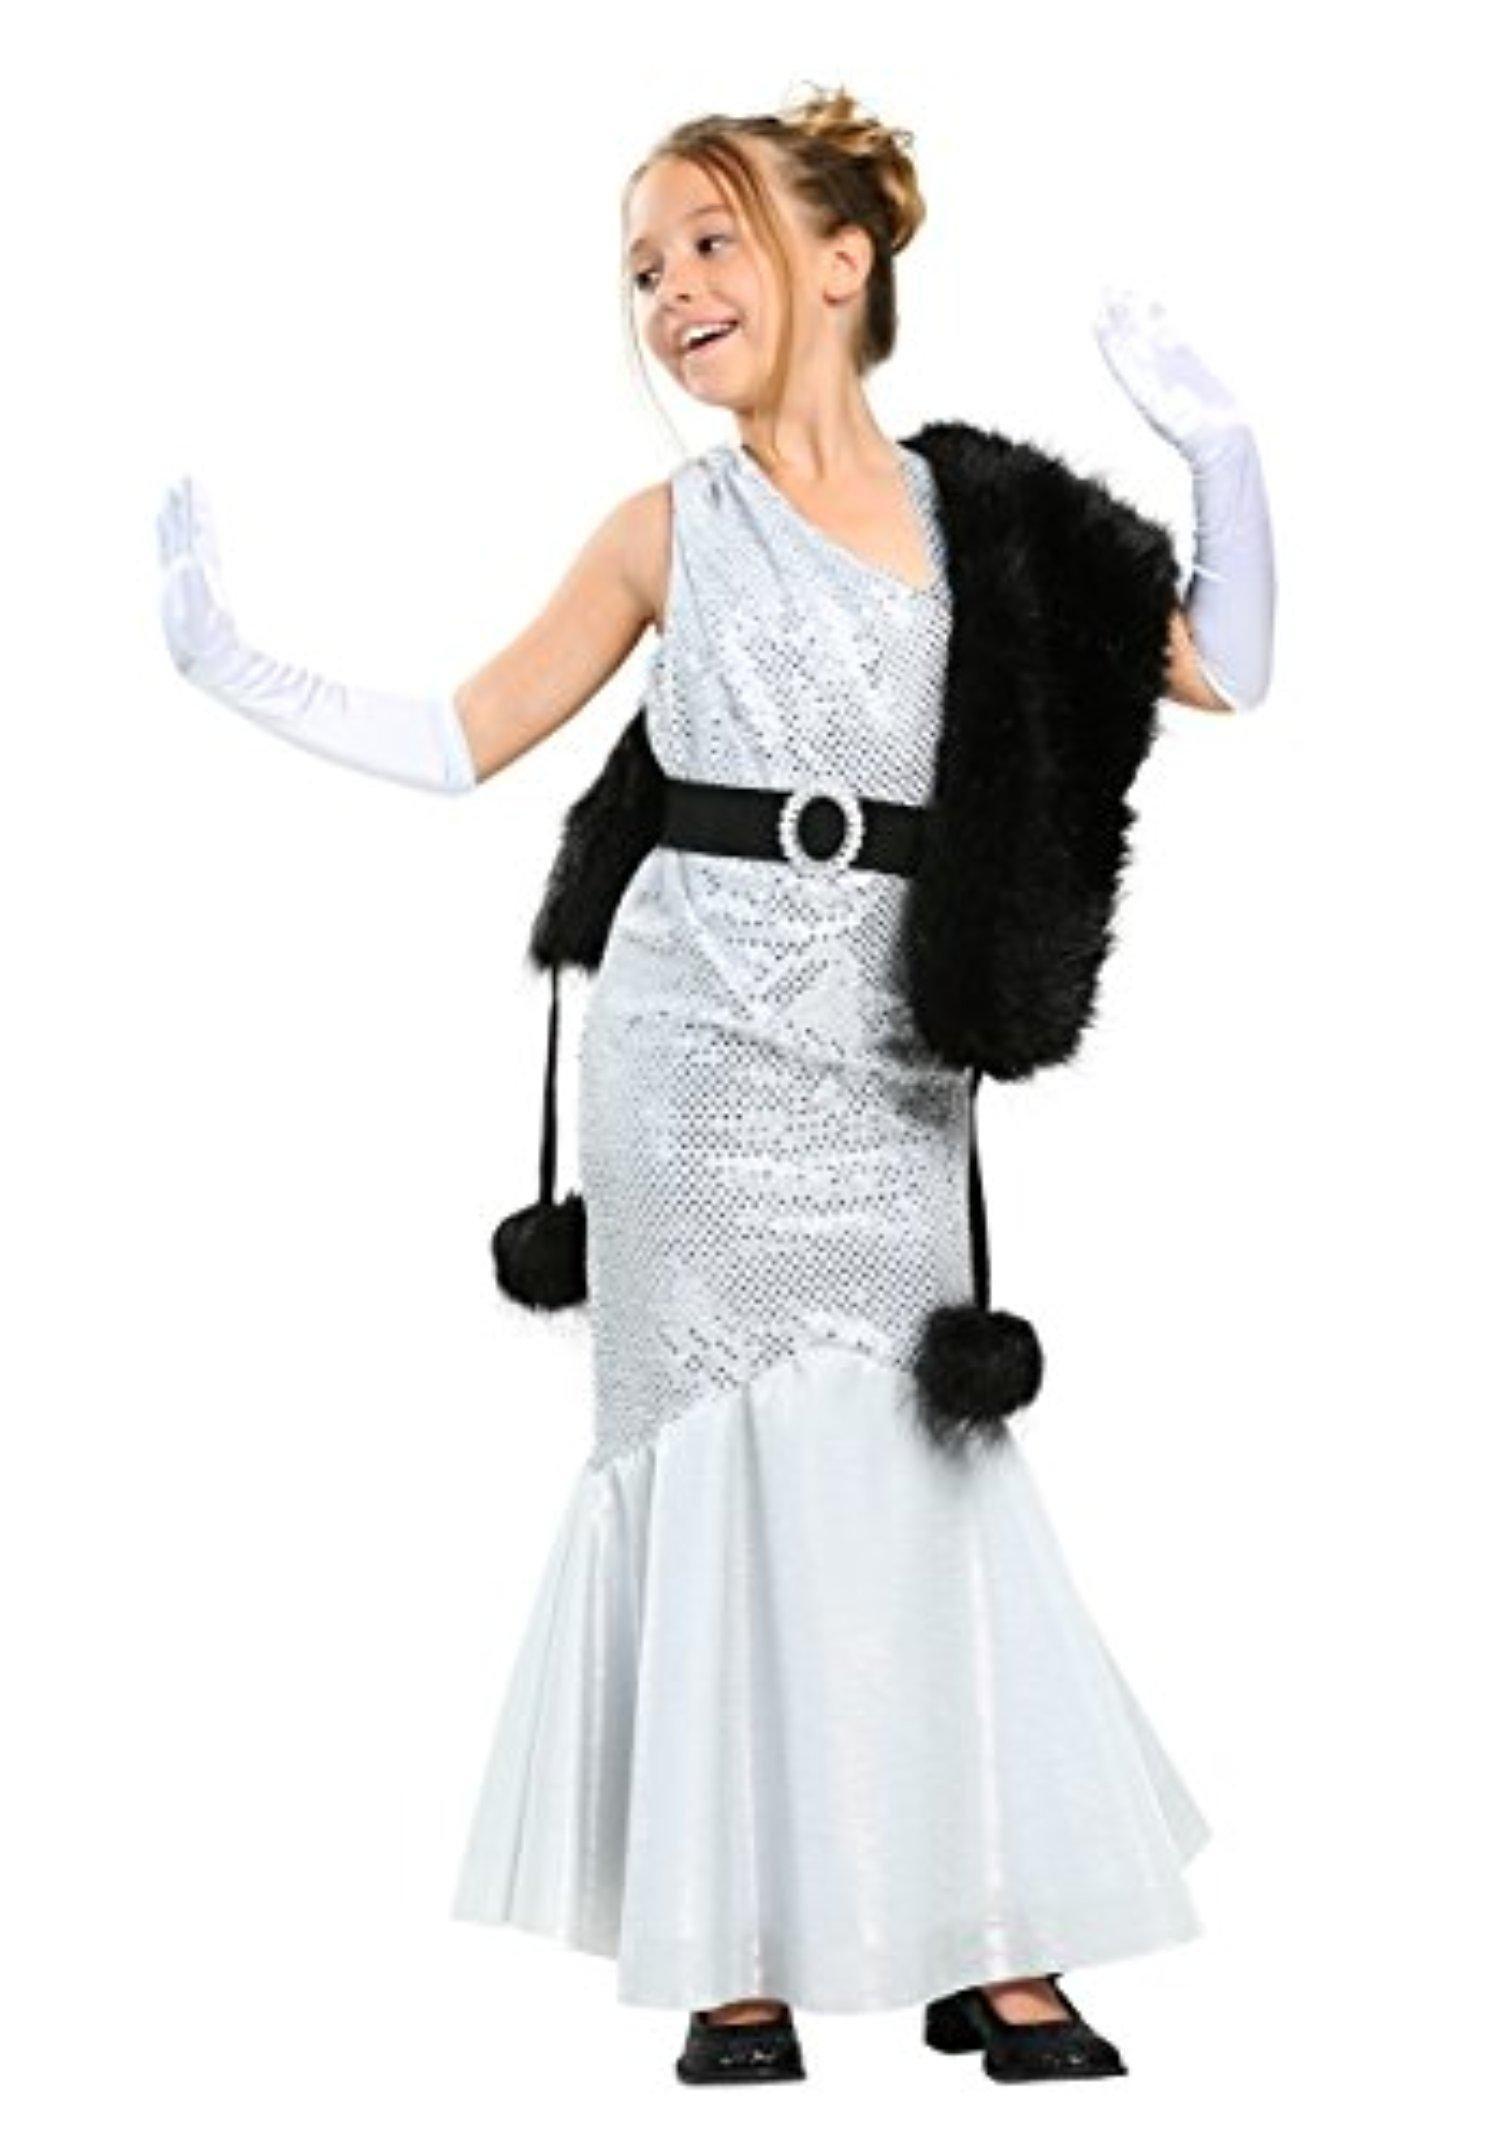 Fun Costumes girls Girls Silver Movie Star Costume Medium (8-10) - Brought to you by Avarsha.com  sc 1 st  Pinterest & Fun Costumes girls Girls Silver Movie Star Costume Medium (8-10 ...